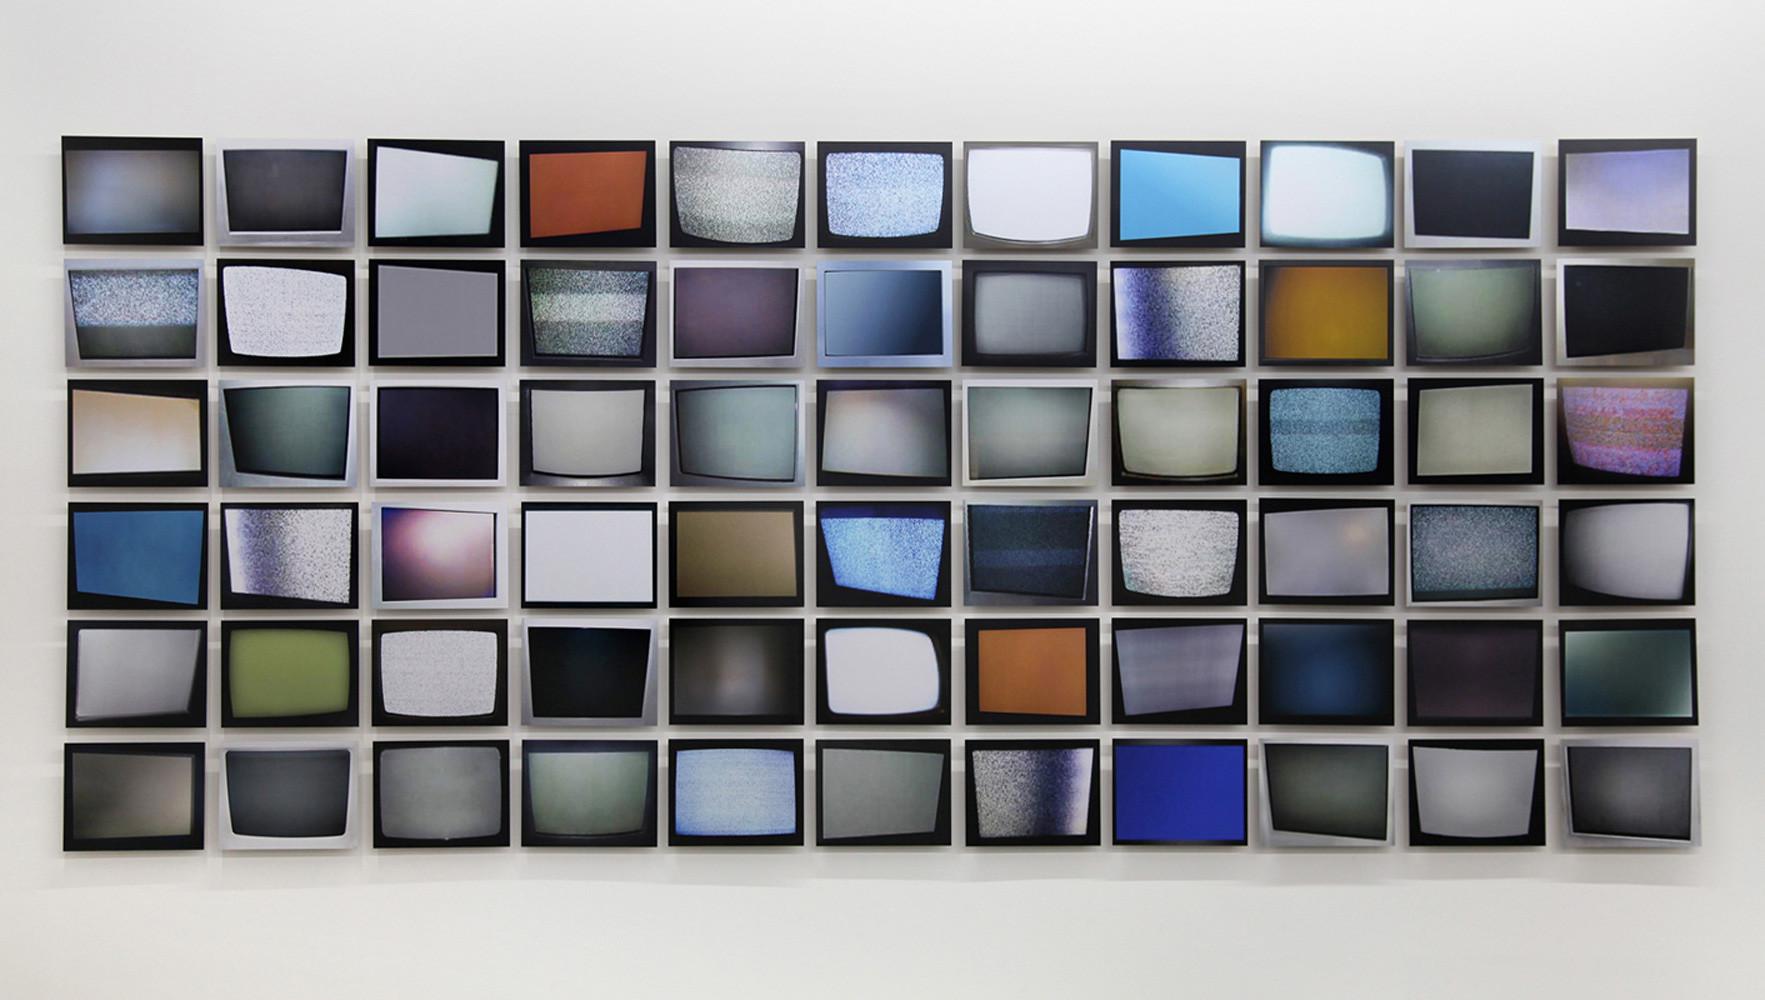 W.M.H. – 9/22/16 (Penelope Umbrico, 2011)